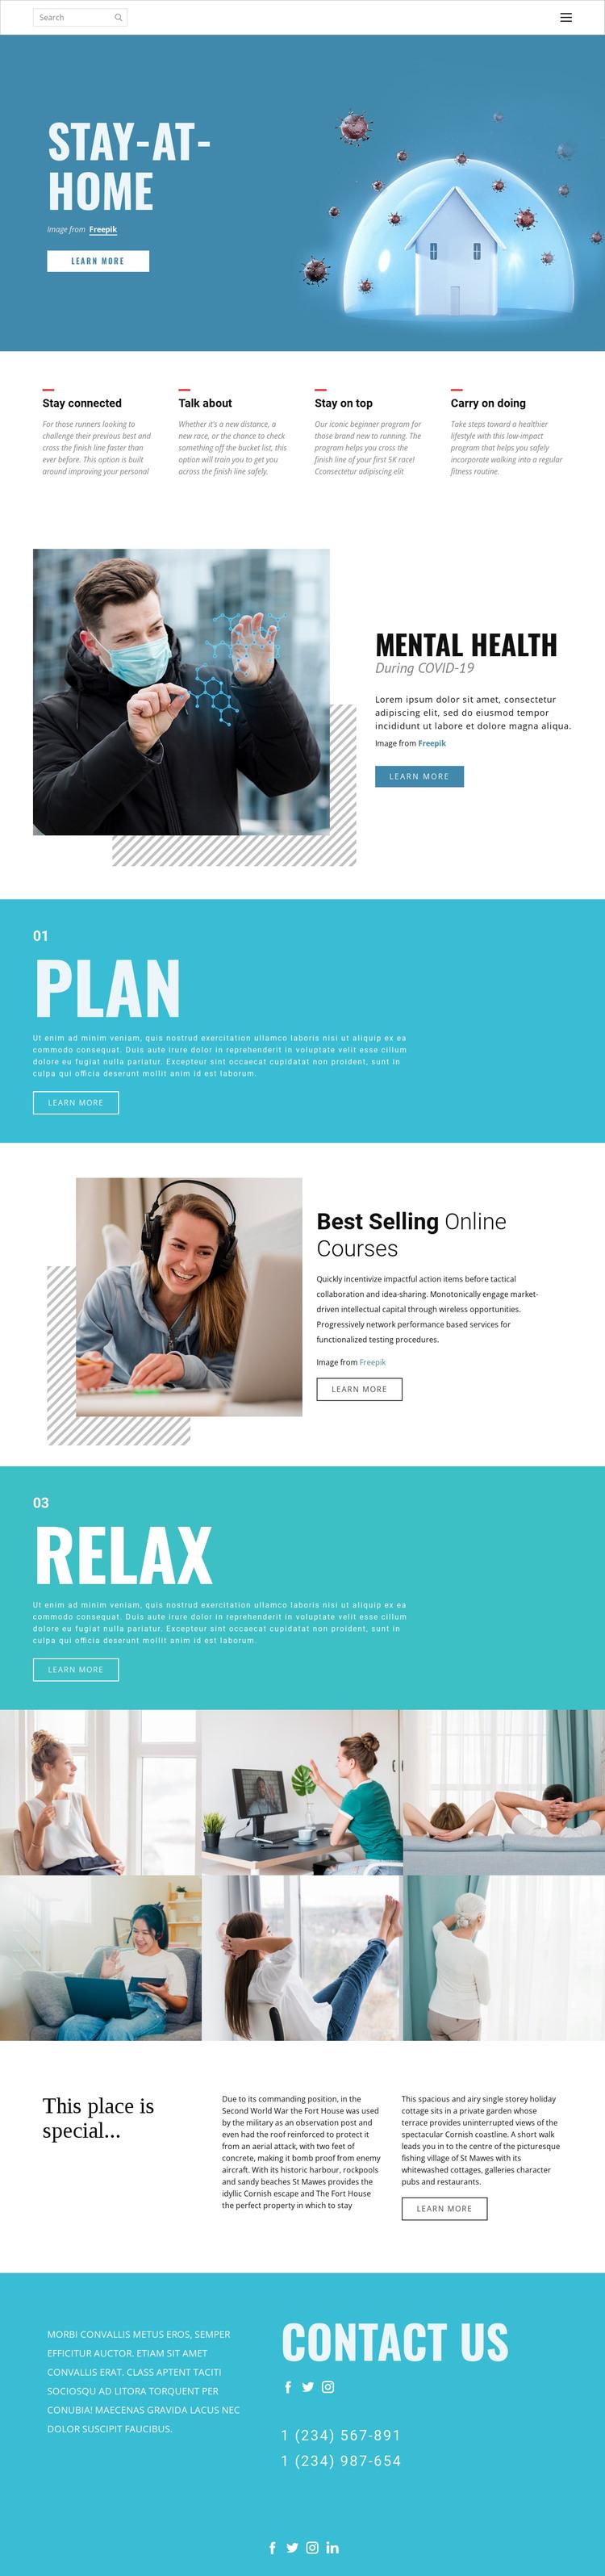 Stay-at-home medicine Web Design